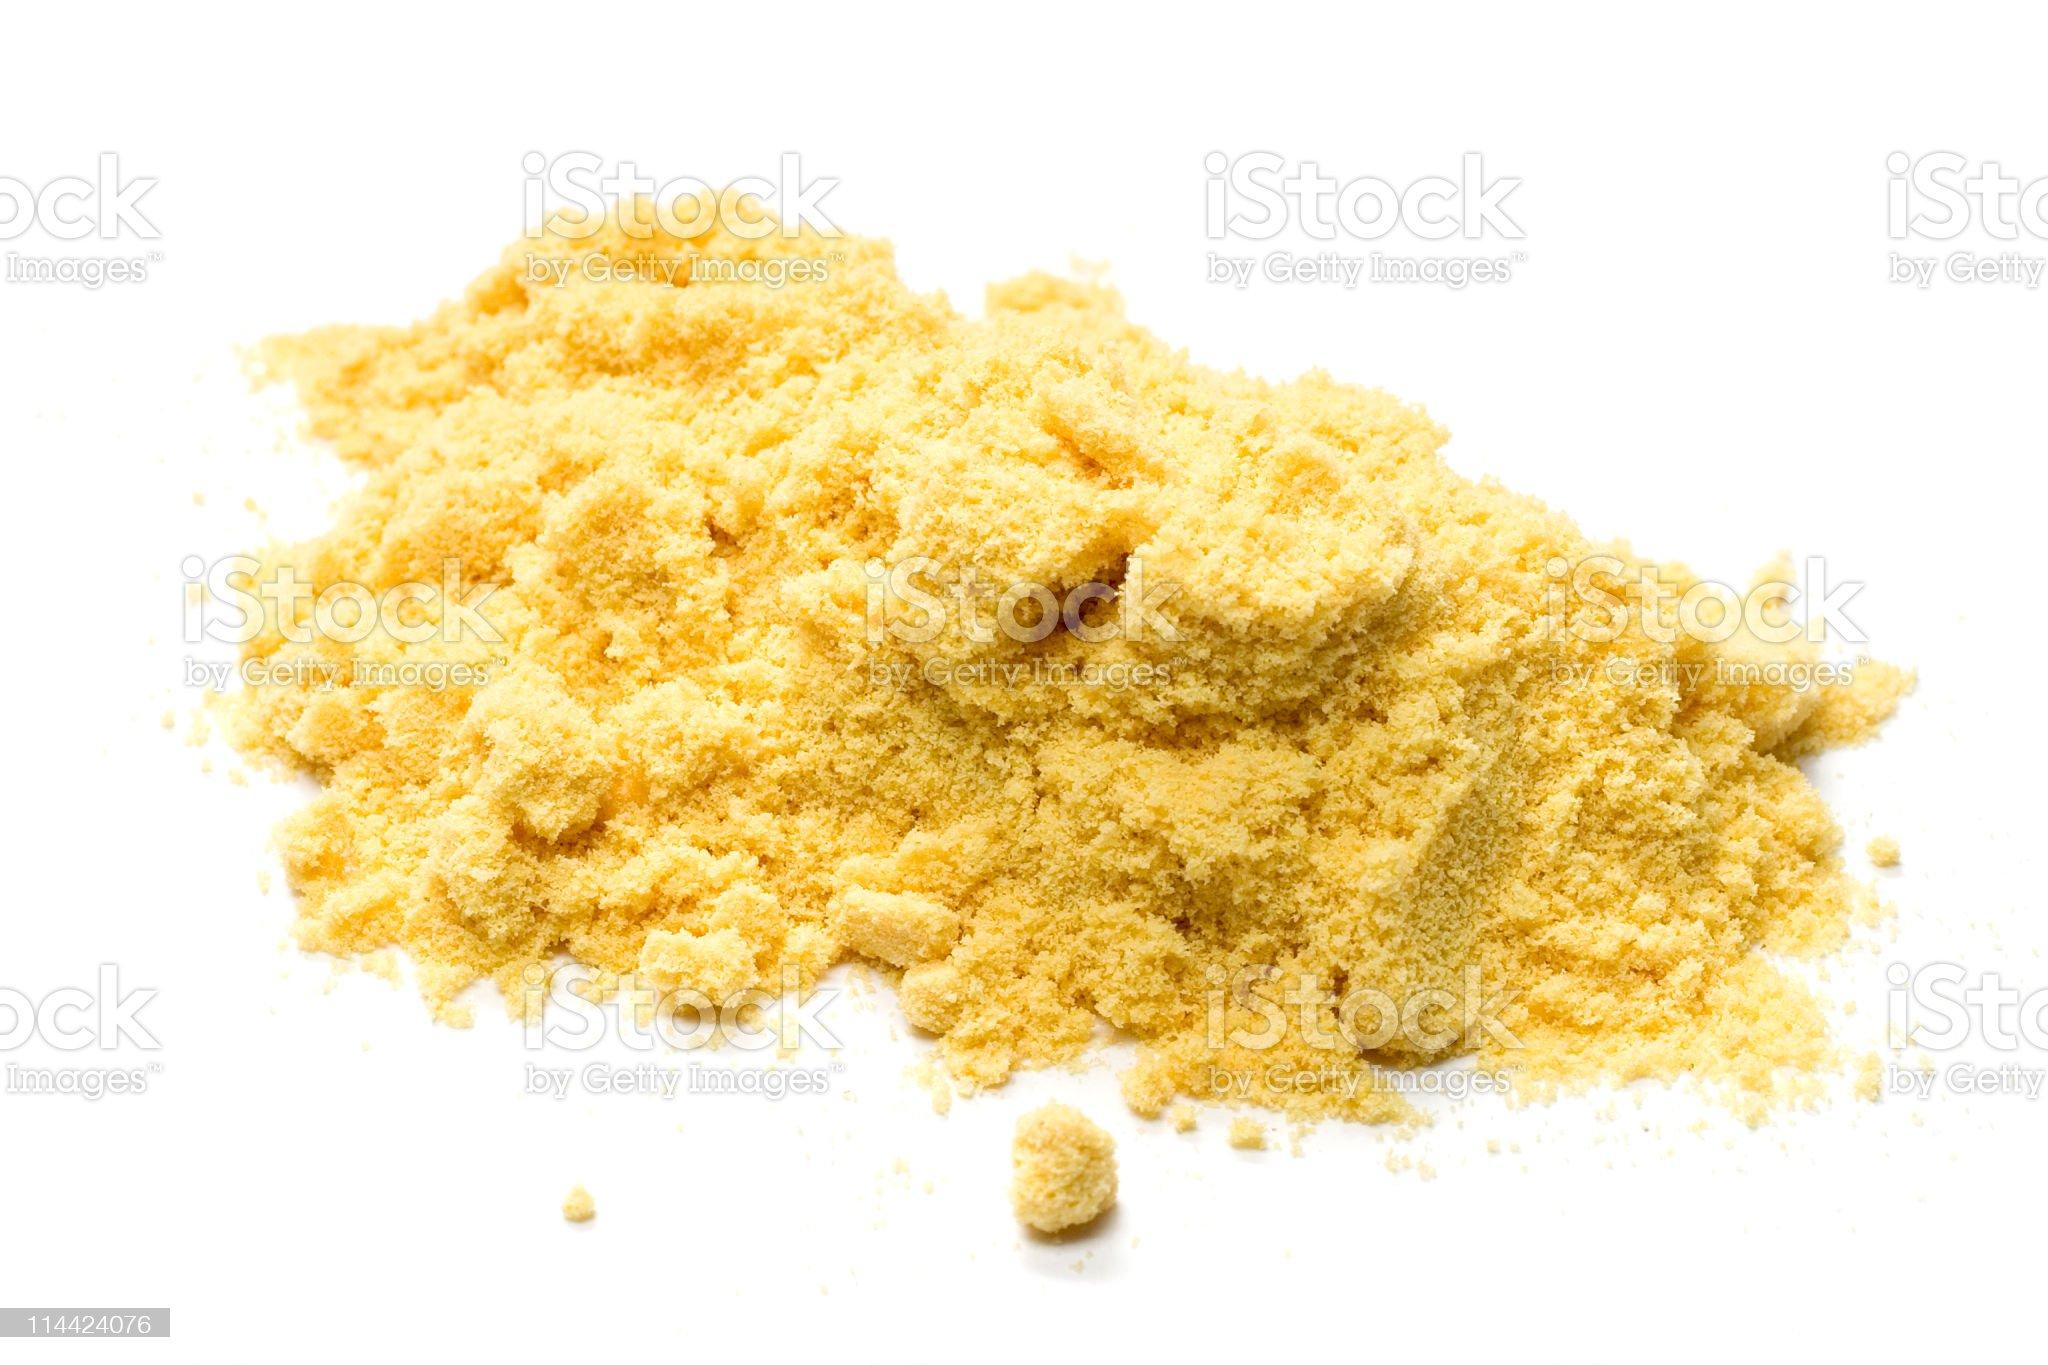 Mustard powder on a white background royalty-free stock photo